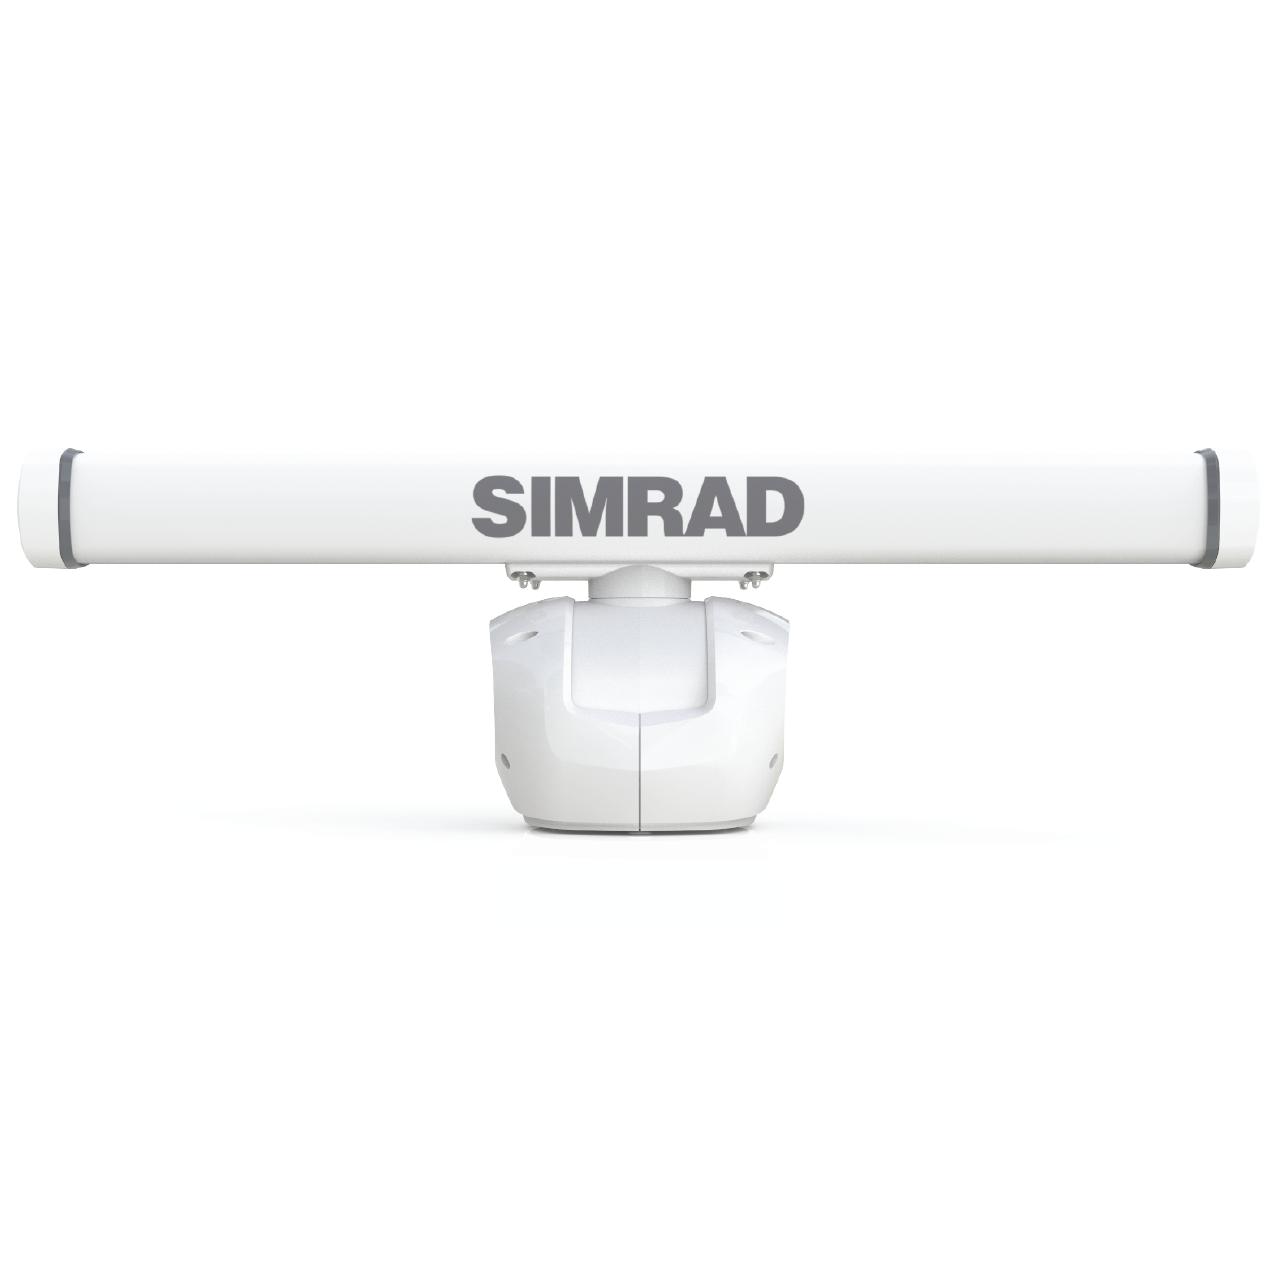 simrad halo 4 open array radar front view